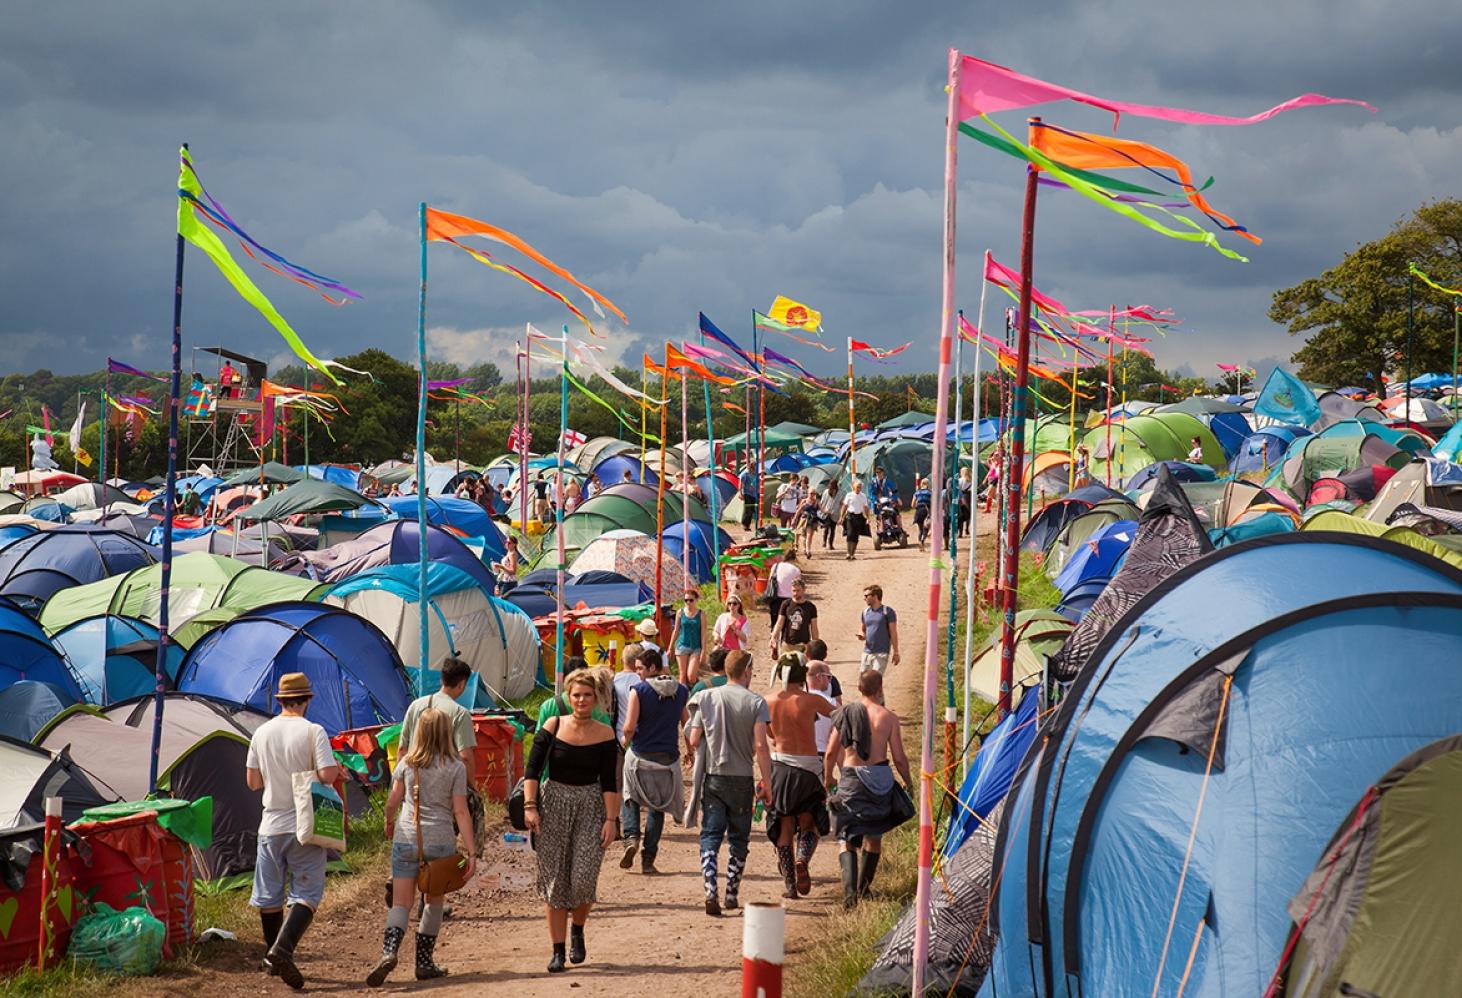 Glastonbury Festival (Великобритания, конец июня)